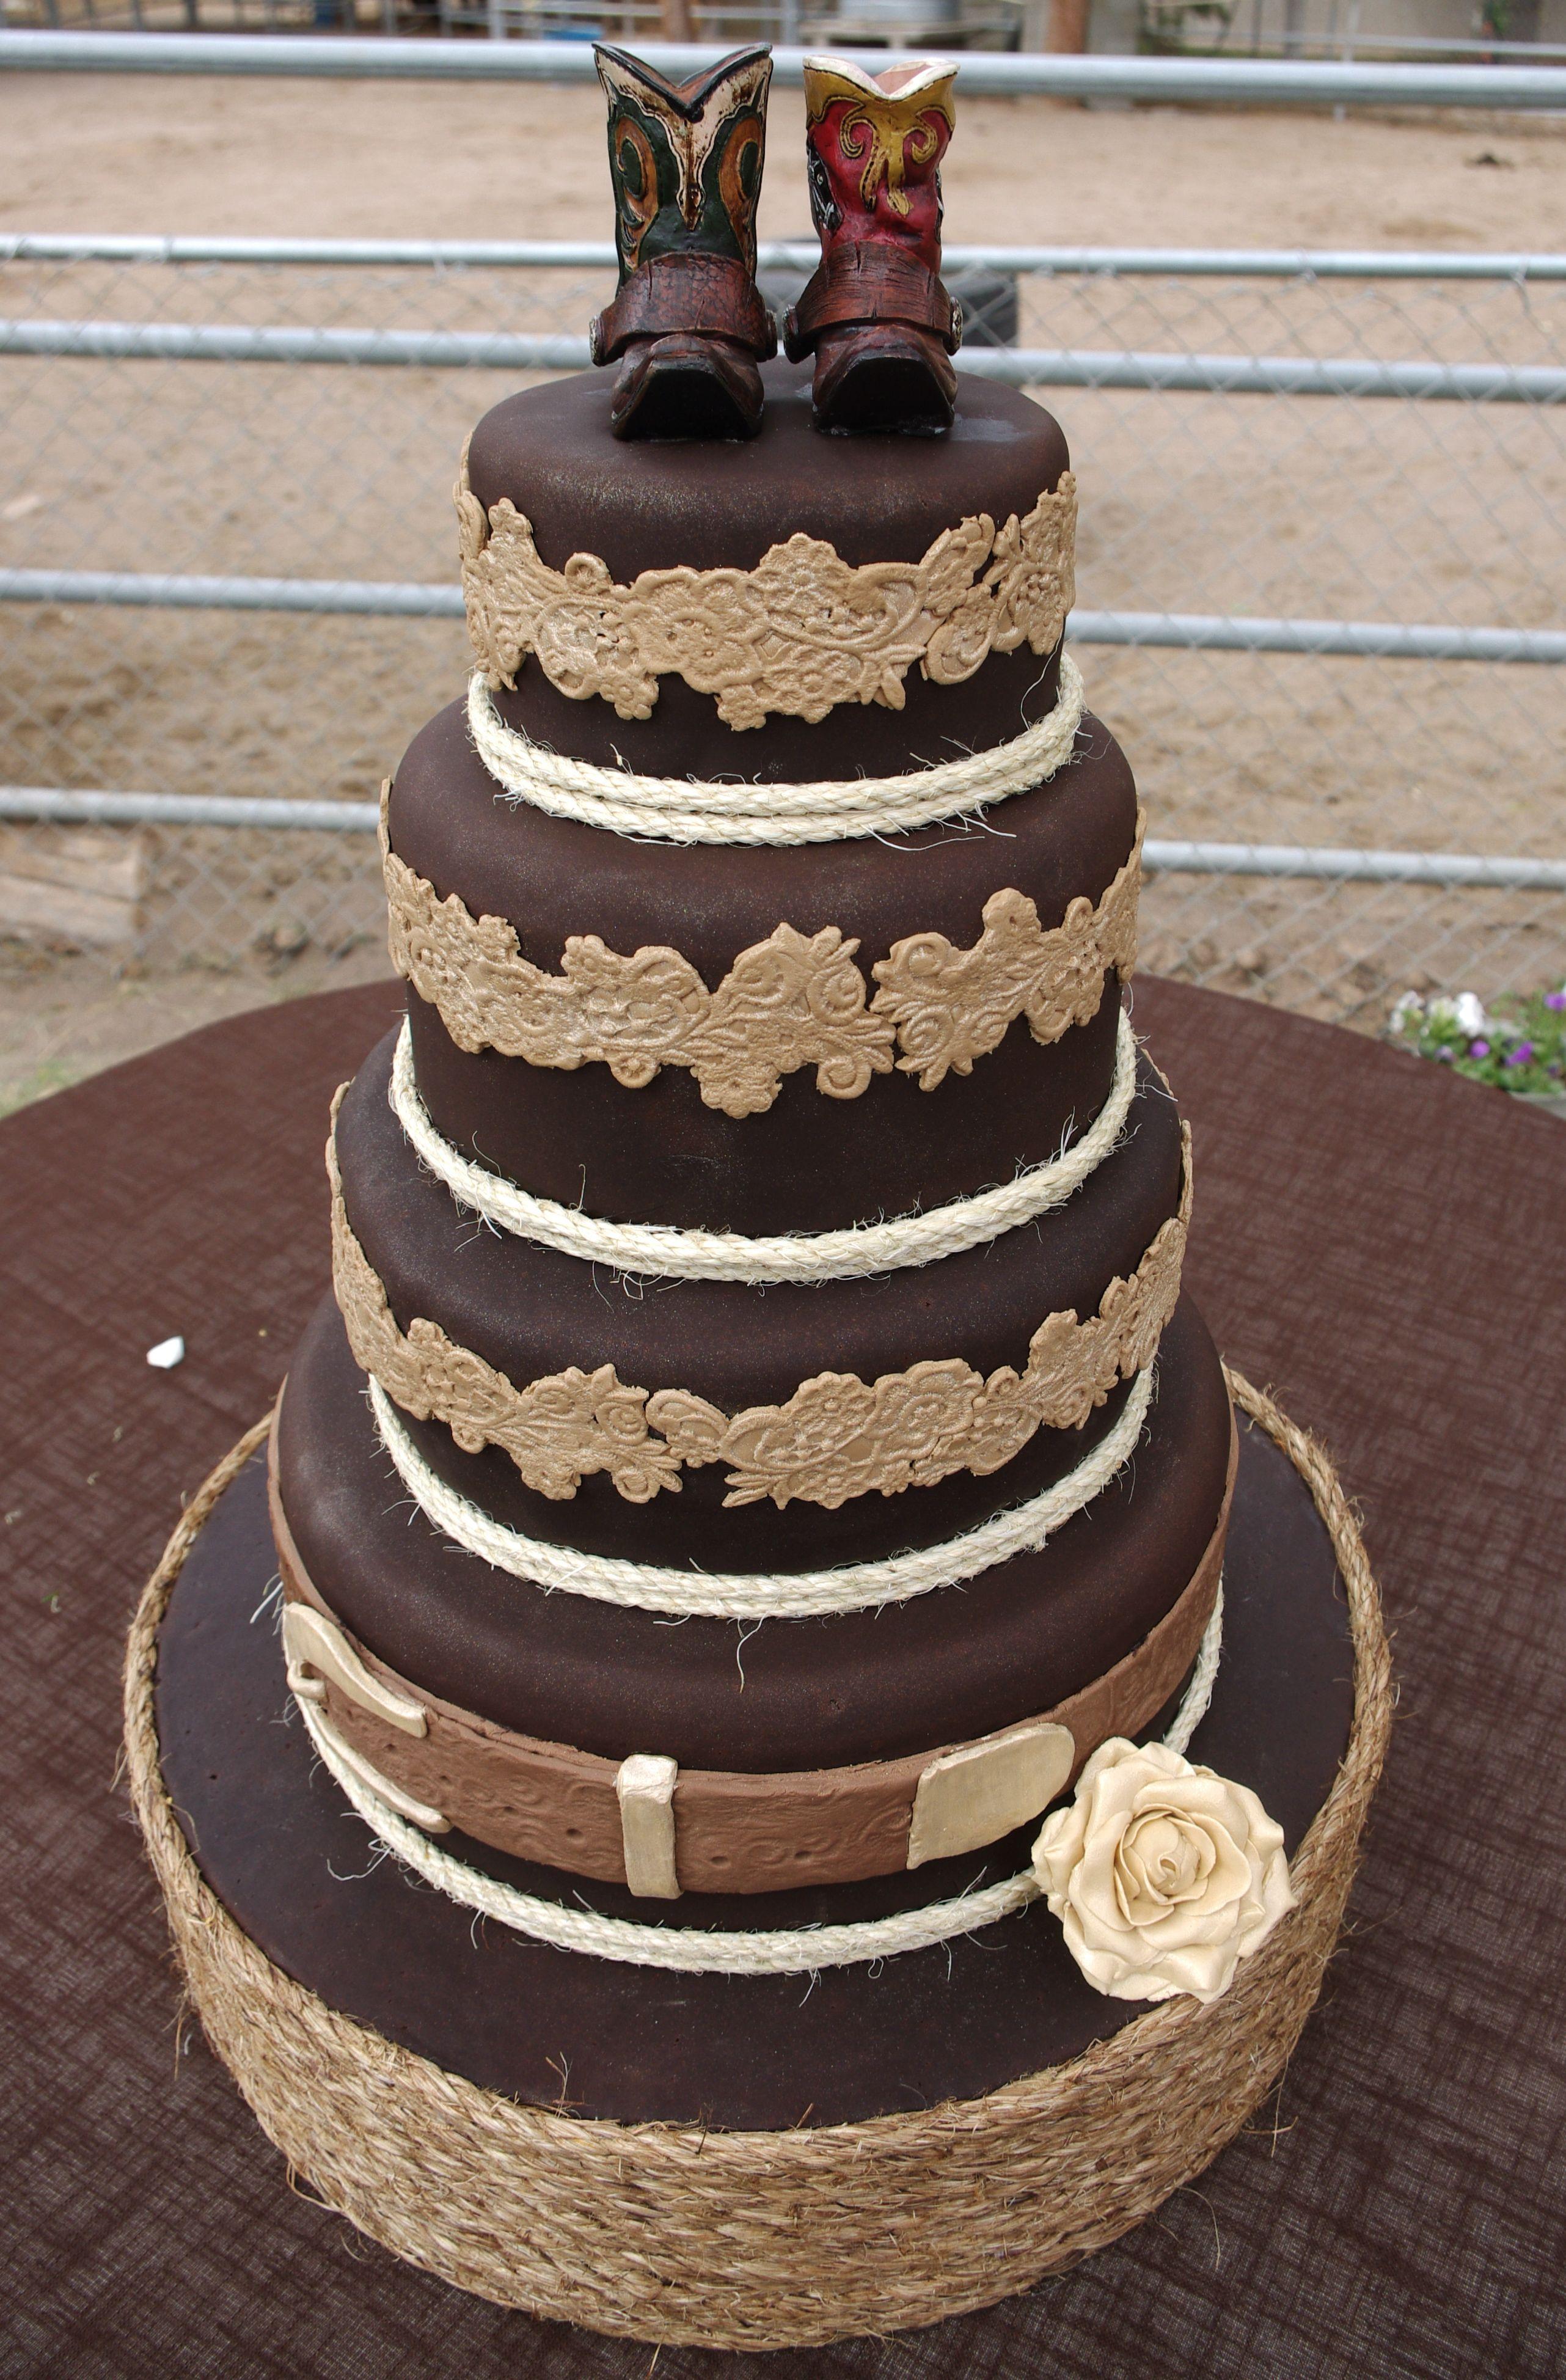 Western Wedding Cake Adorable Looks like my birthday cake